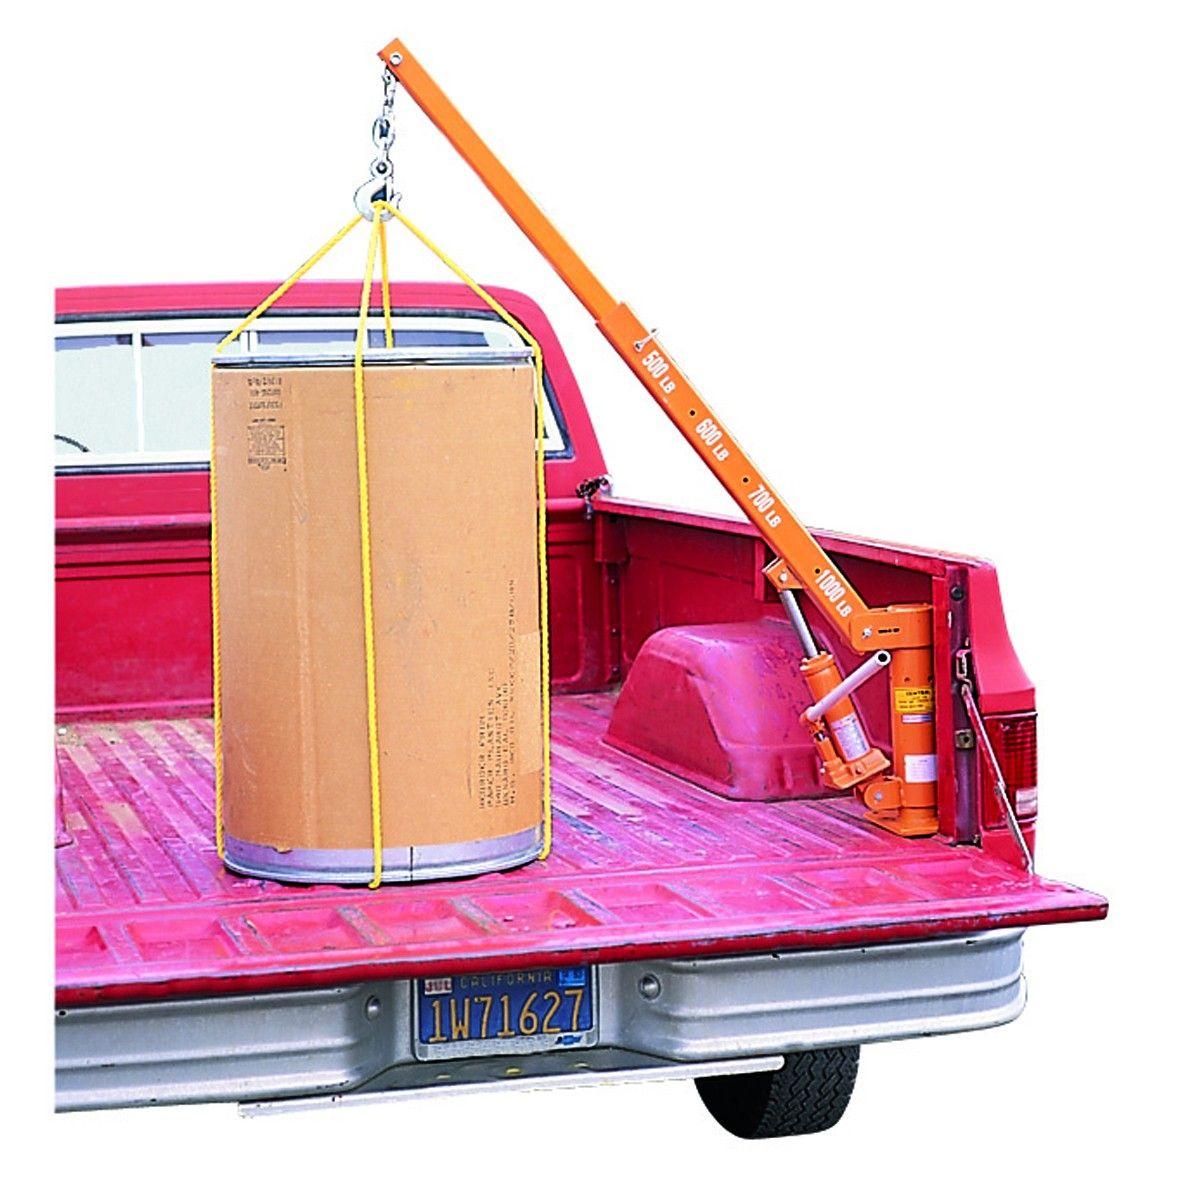 Pickup Truck Bed Crane 1000 Lb Capacity Pickup Trucks Bed Pickup Truck Accessories Pickup Trucks